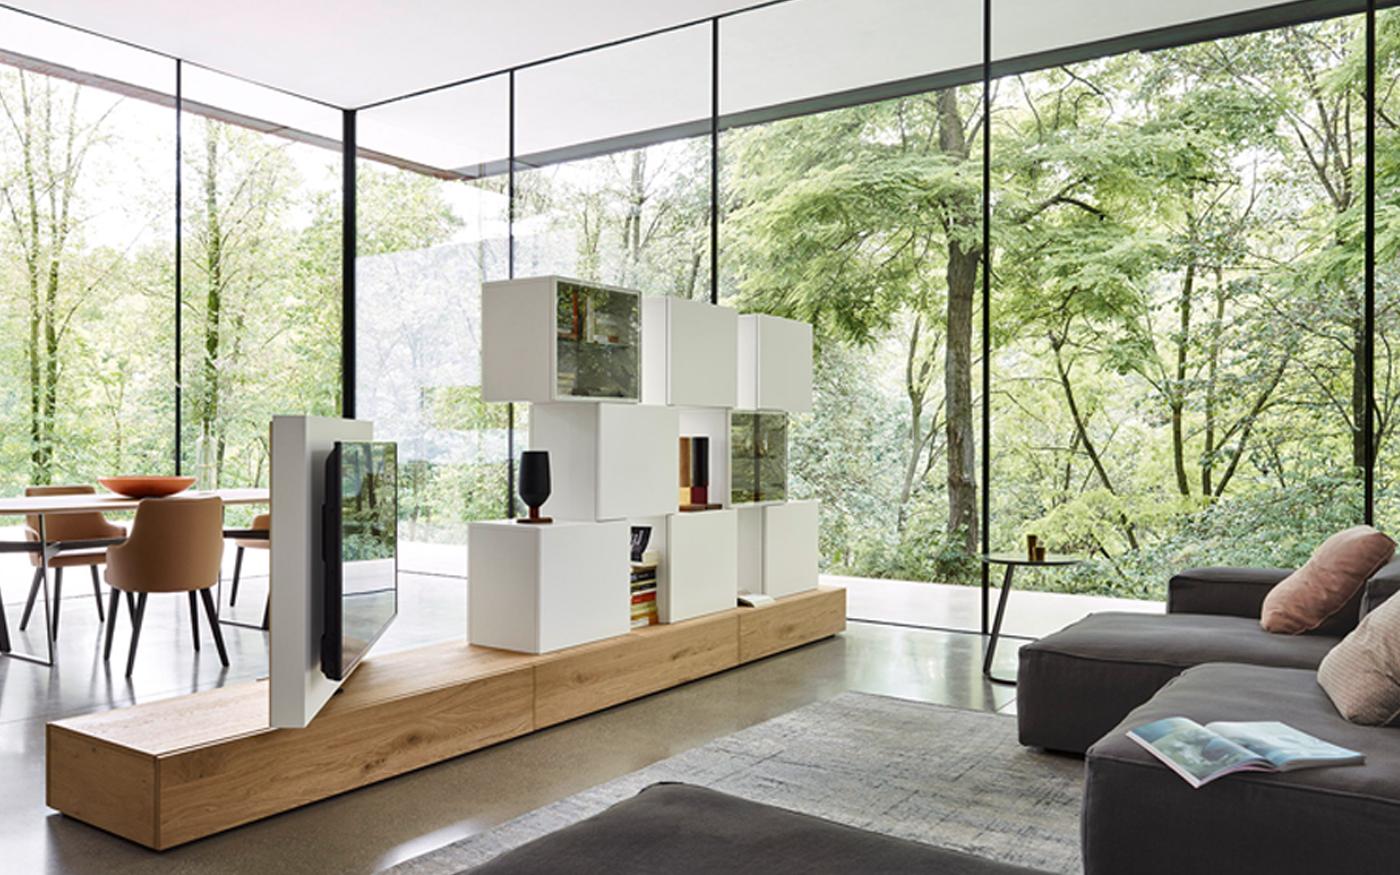 Sangiacomo_LAMPO Tv-meubel roomdivider met glasdeuren